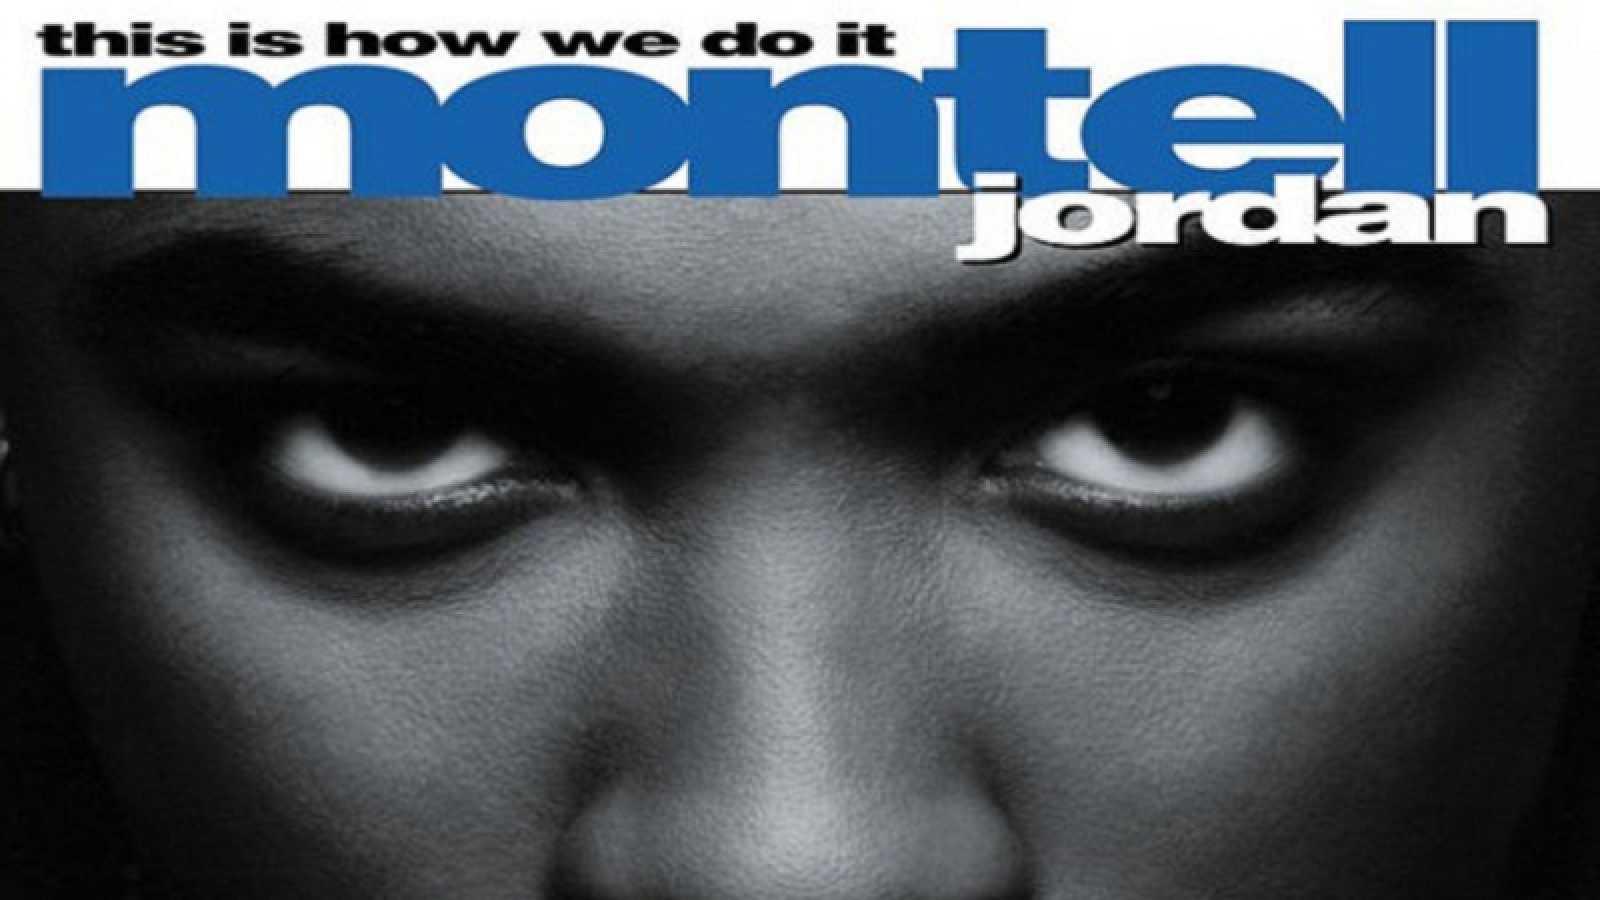 Próxima parada - Prince, Da Brat y Montell Jordan - 07/05/21 - escuchar ahora